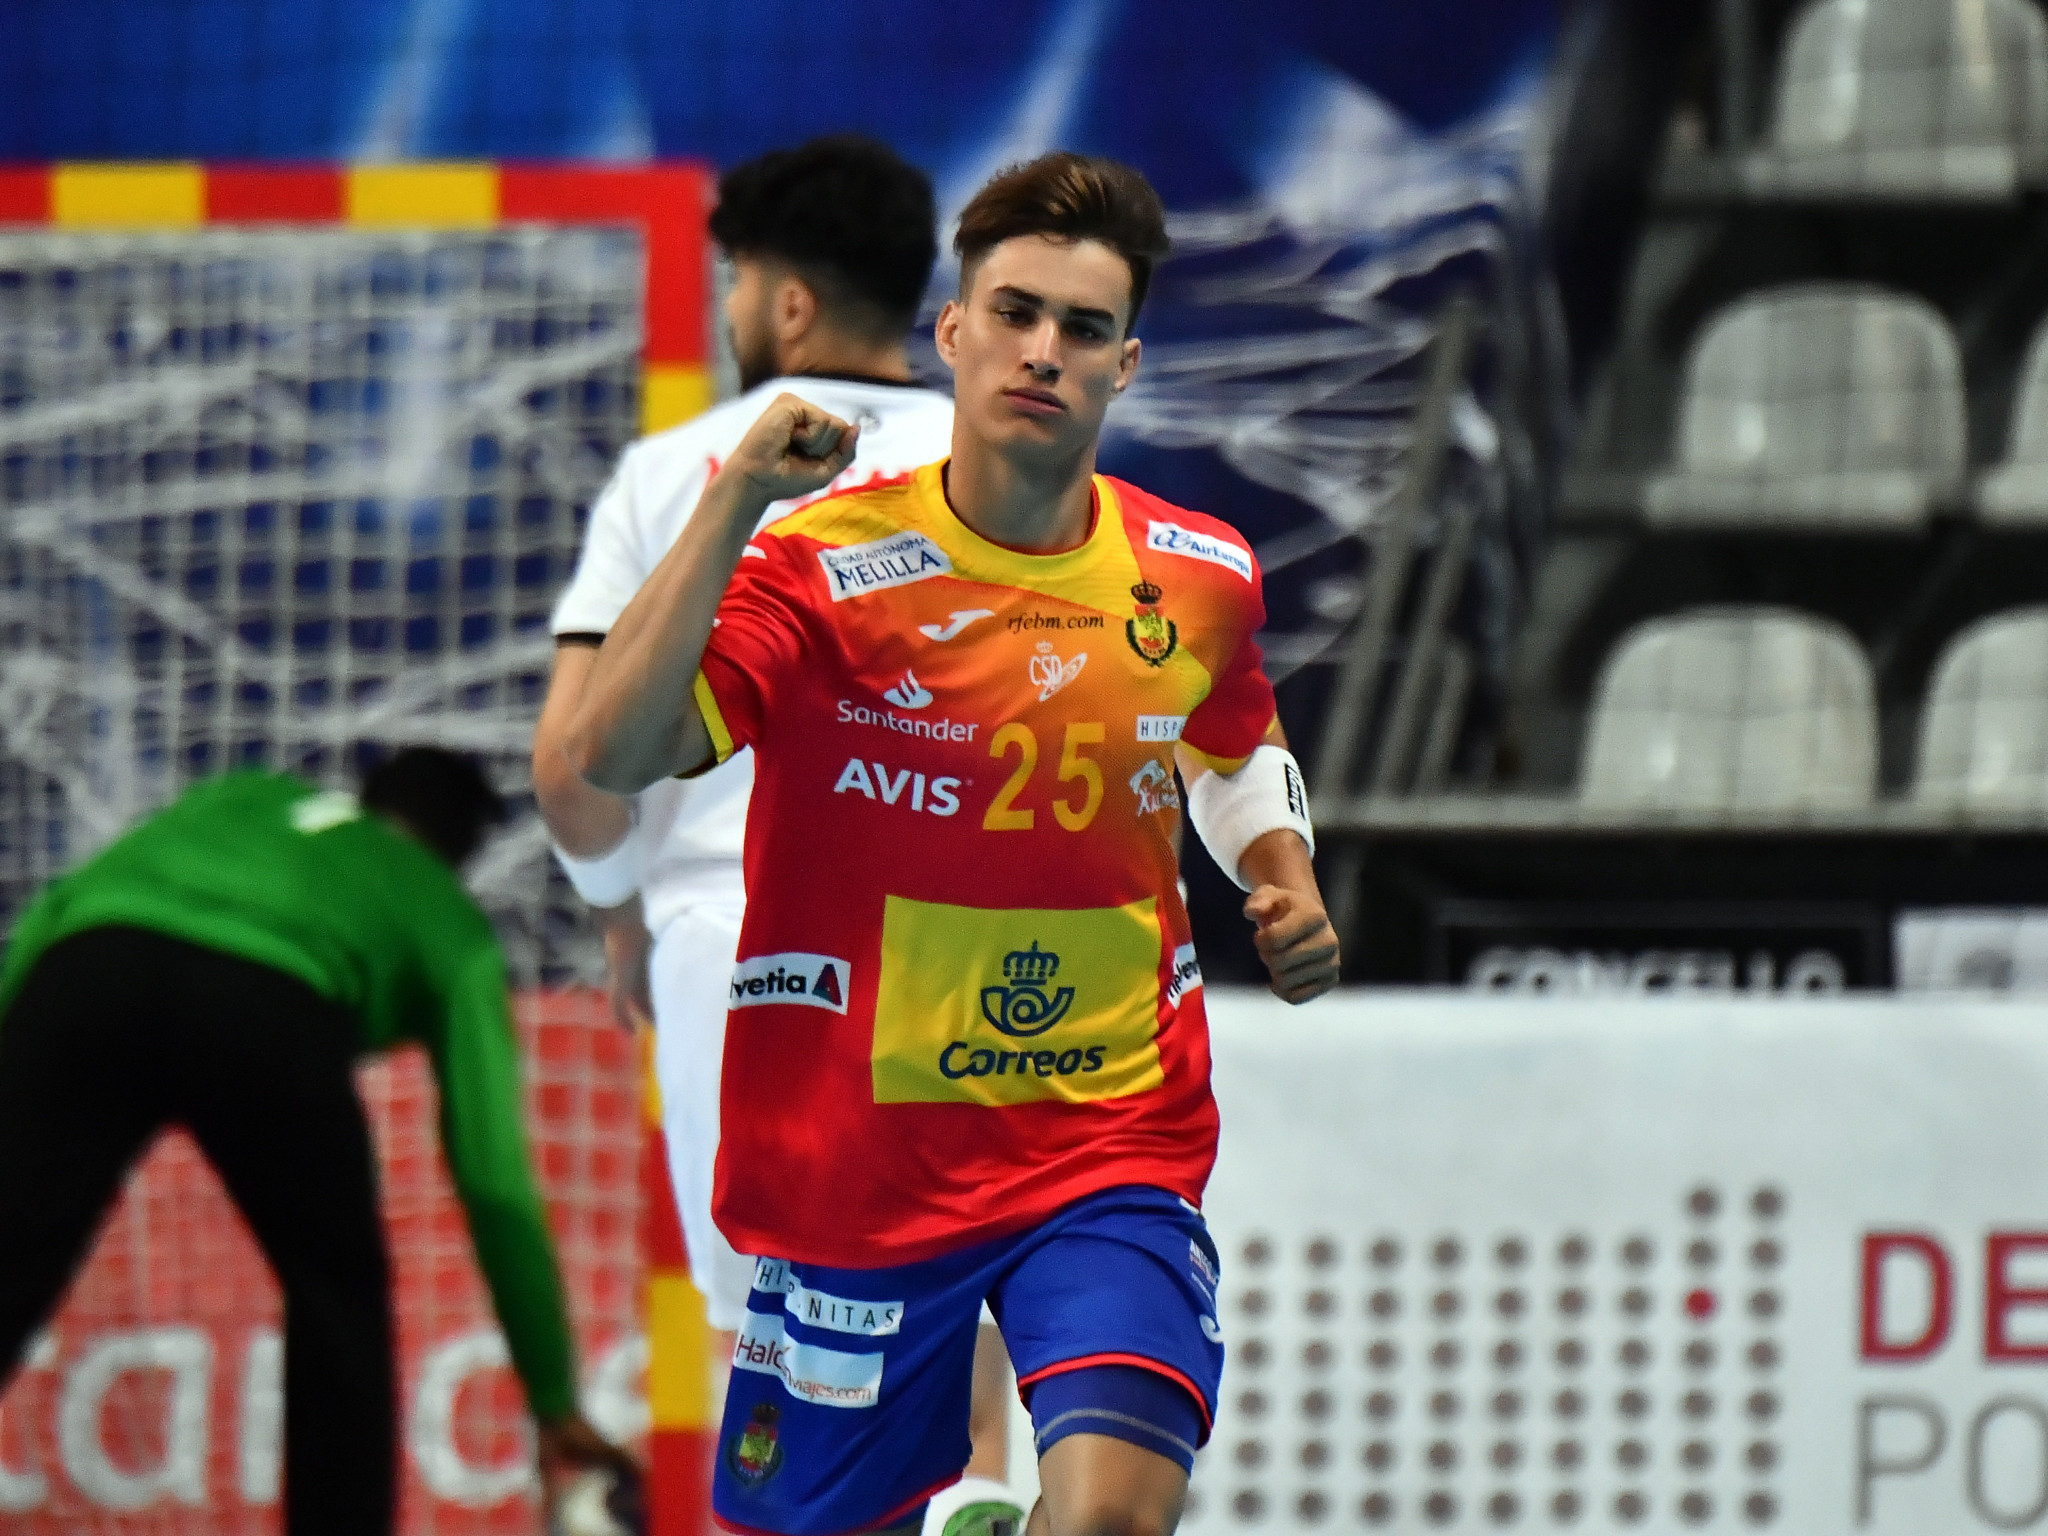 Spain are the hosts of the Men's Junior World Handball Championship ©IHF/Twitter